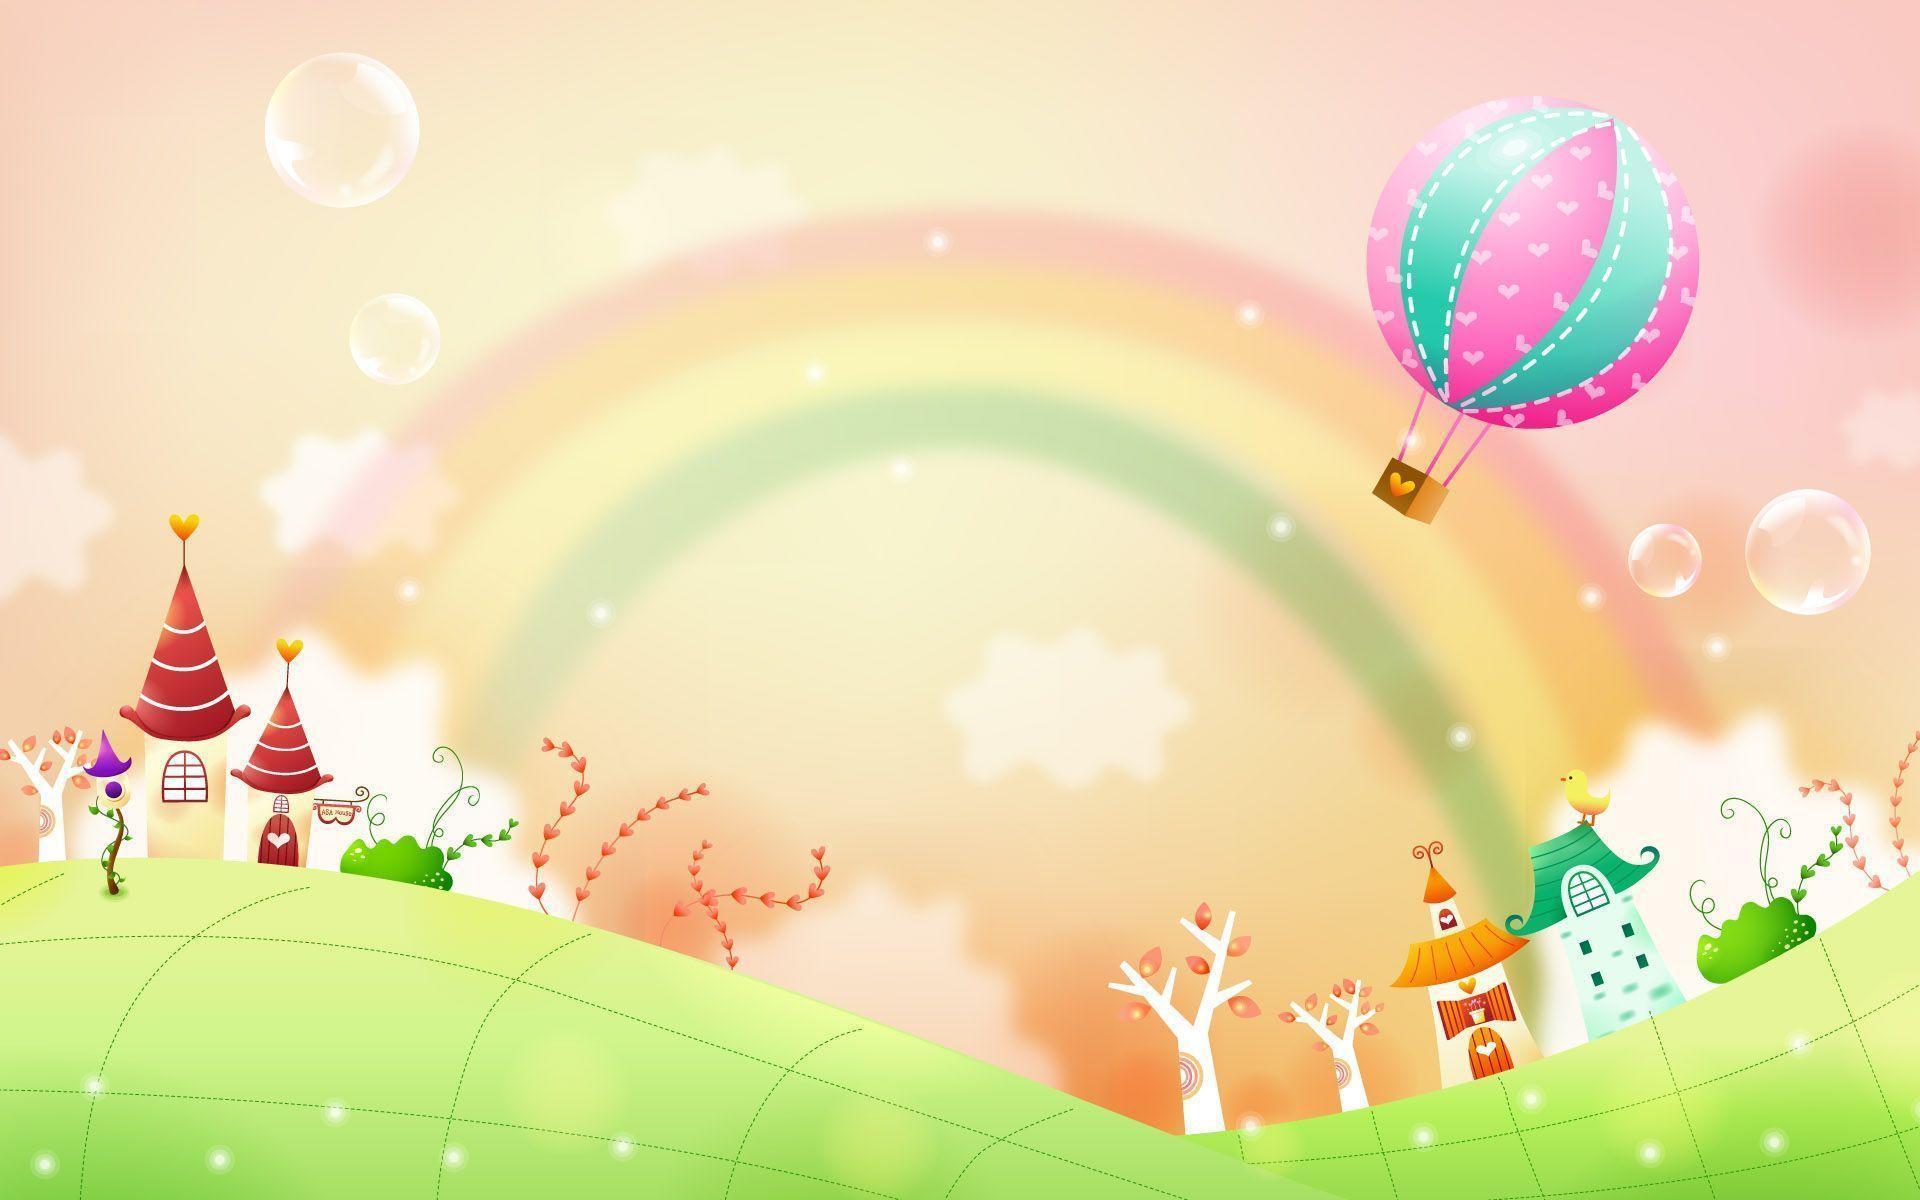 Cartooning The Ultimate Character Design Book Free Download : Cute cartoon wallpapers wallpaper cave